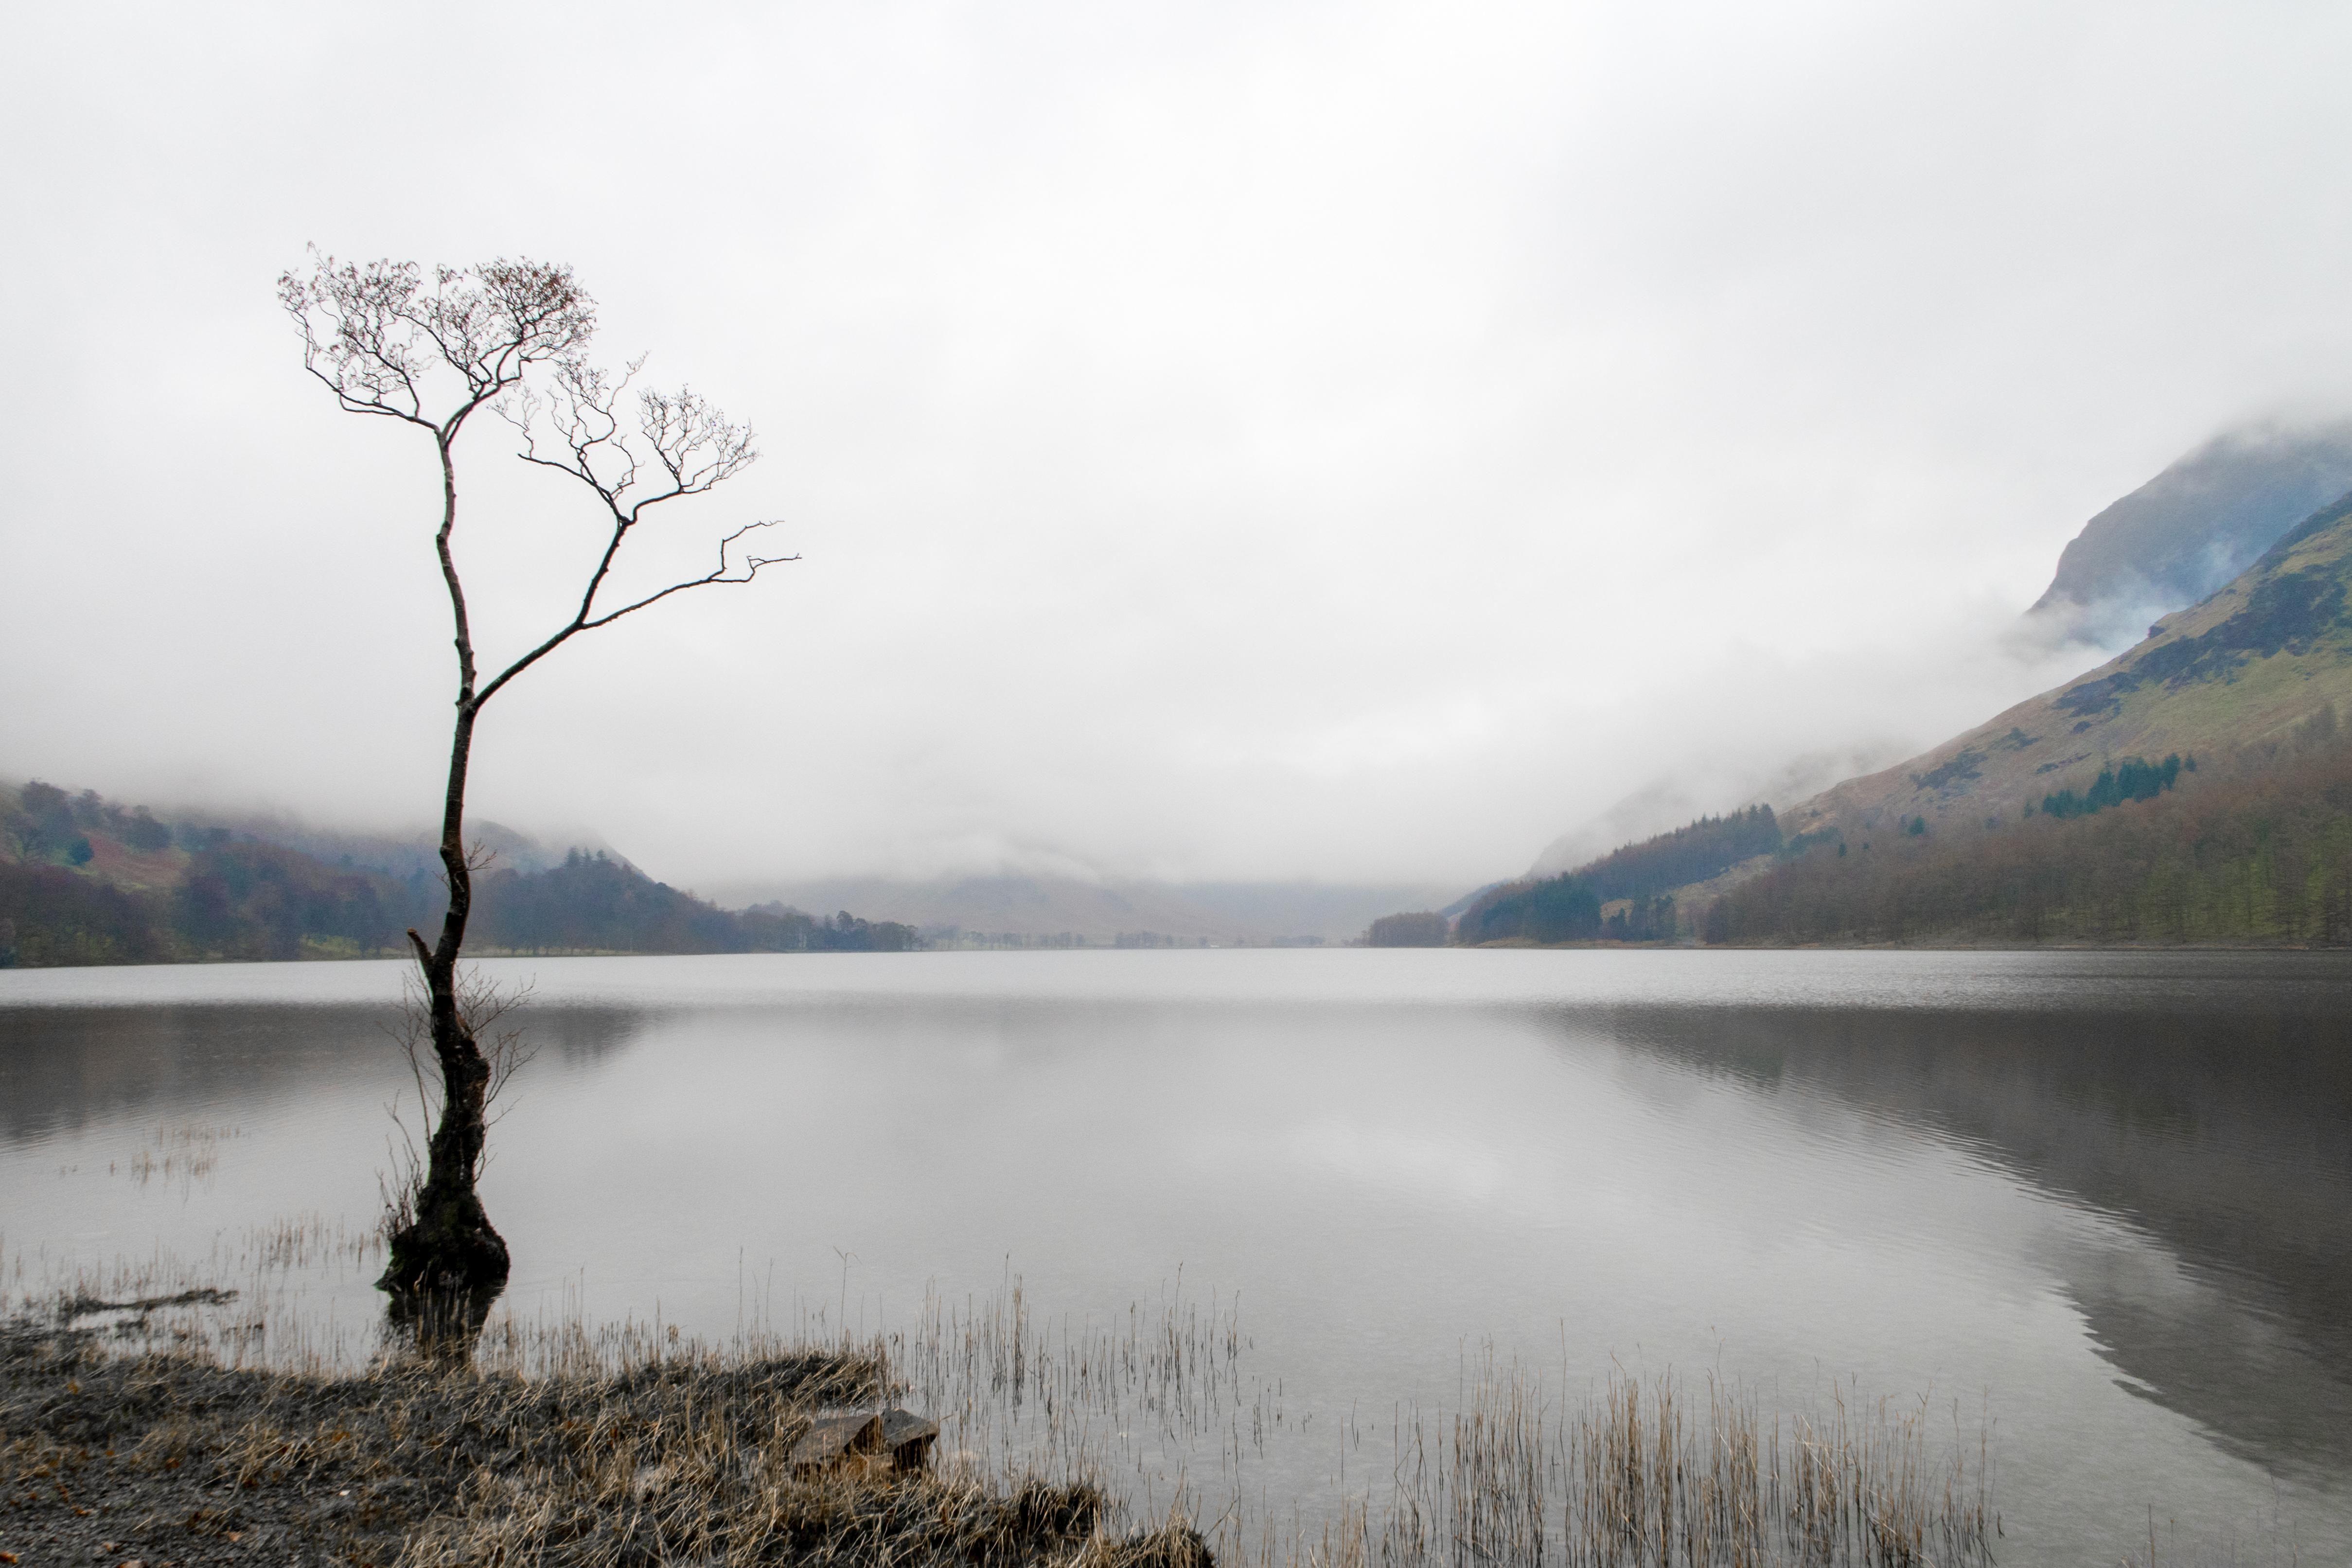 The lone tree lake district oc rollingsloane